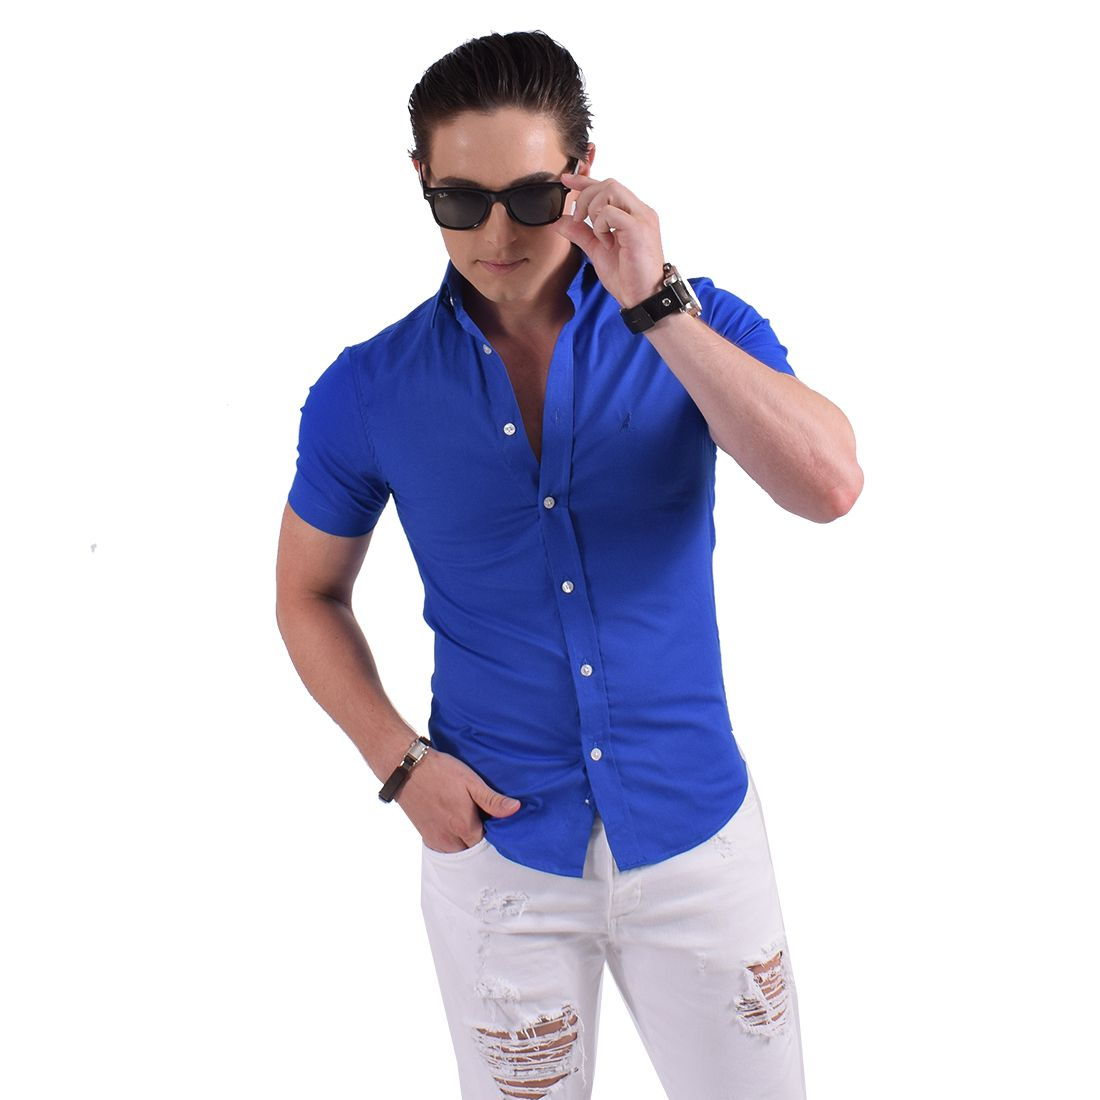 500204 - Camisa Social Manga Curta Masculina Slim Azul - LEVOK